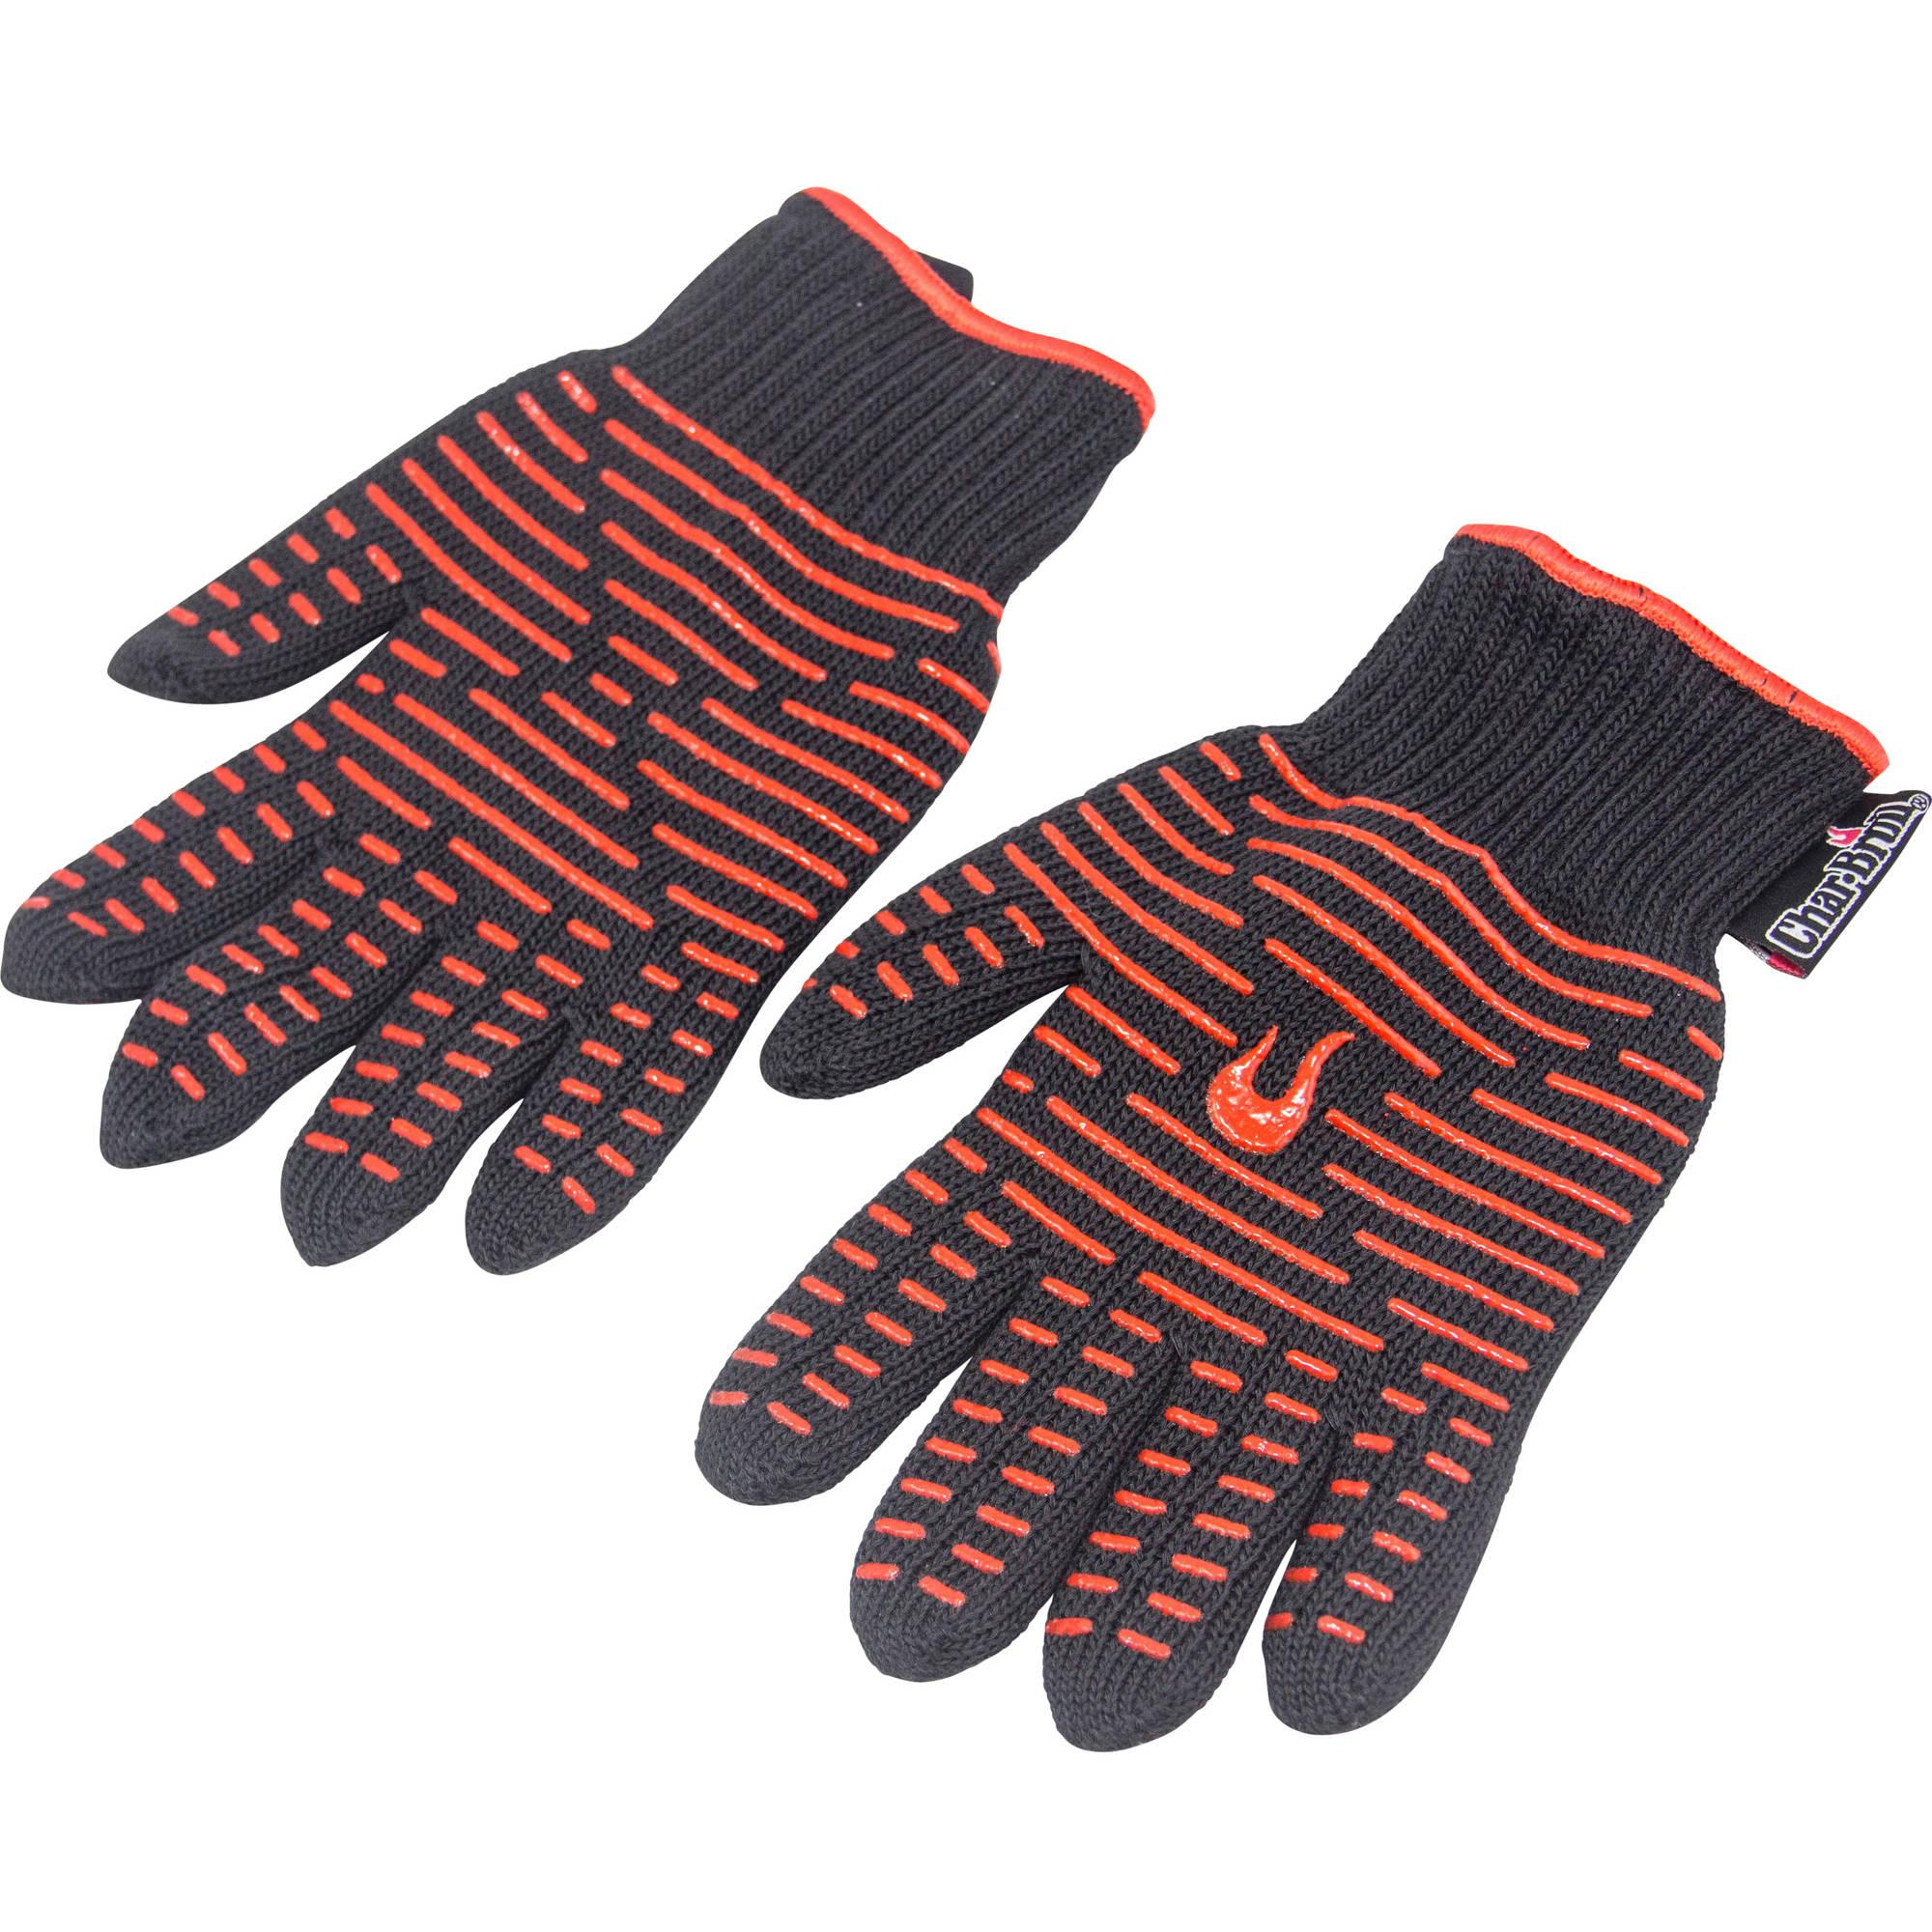 Char Broil Aramid-Blend Cotton Grilling Gloves